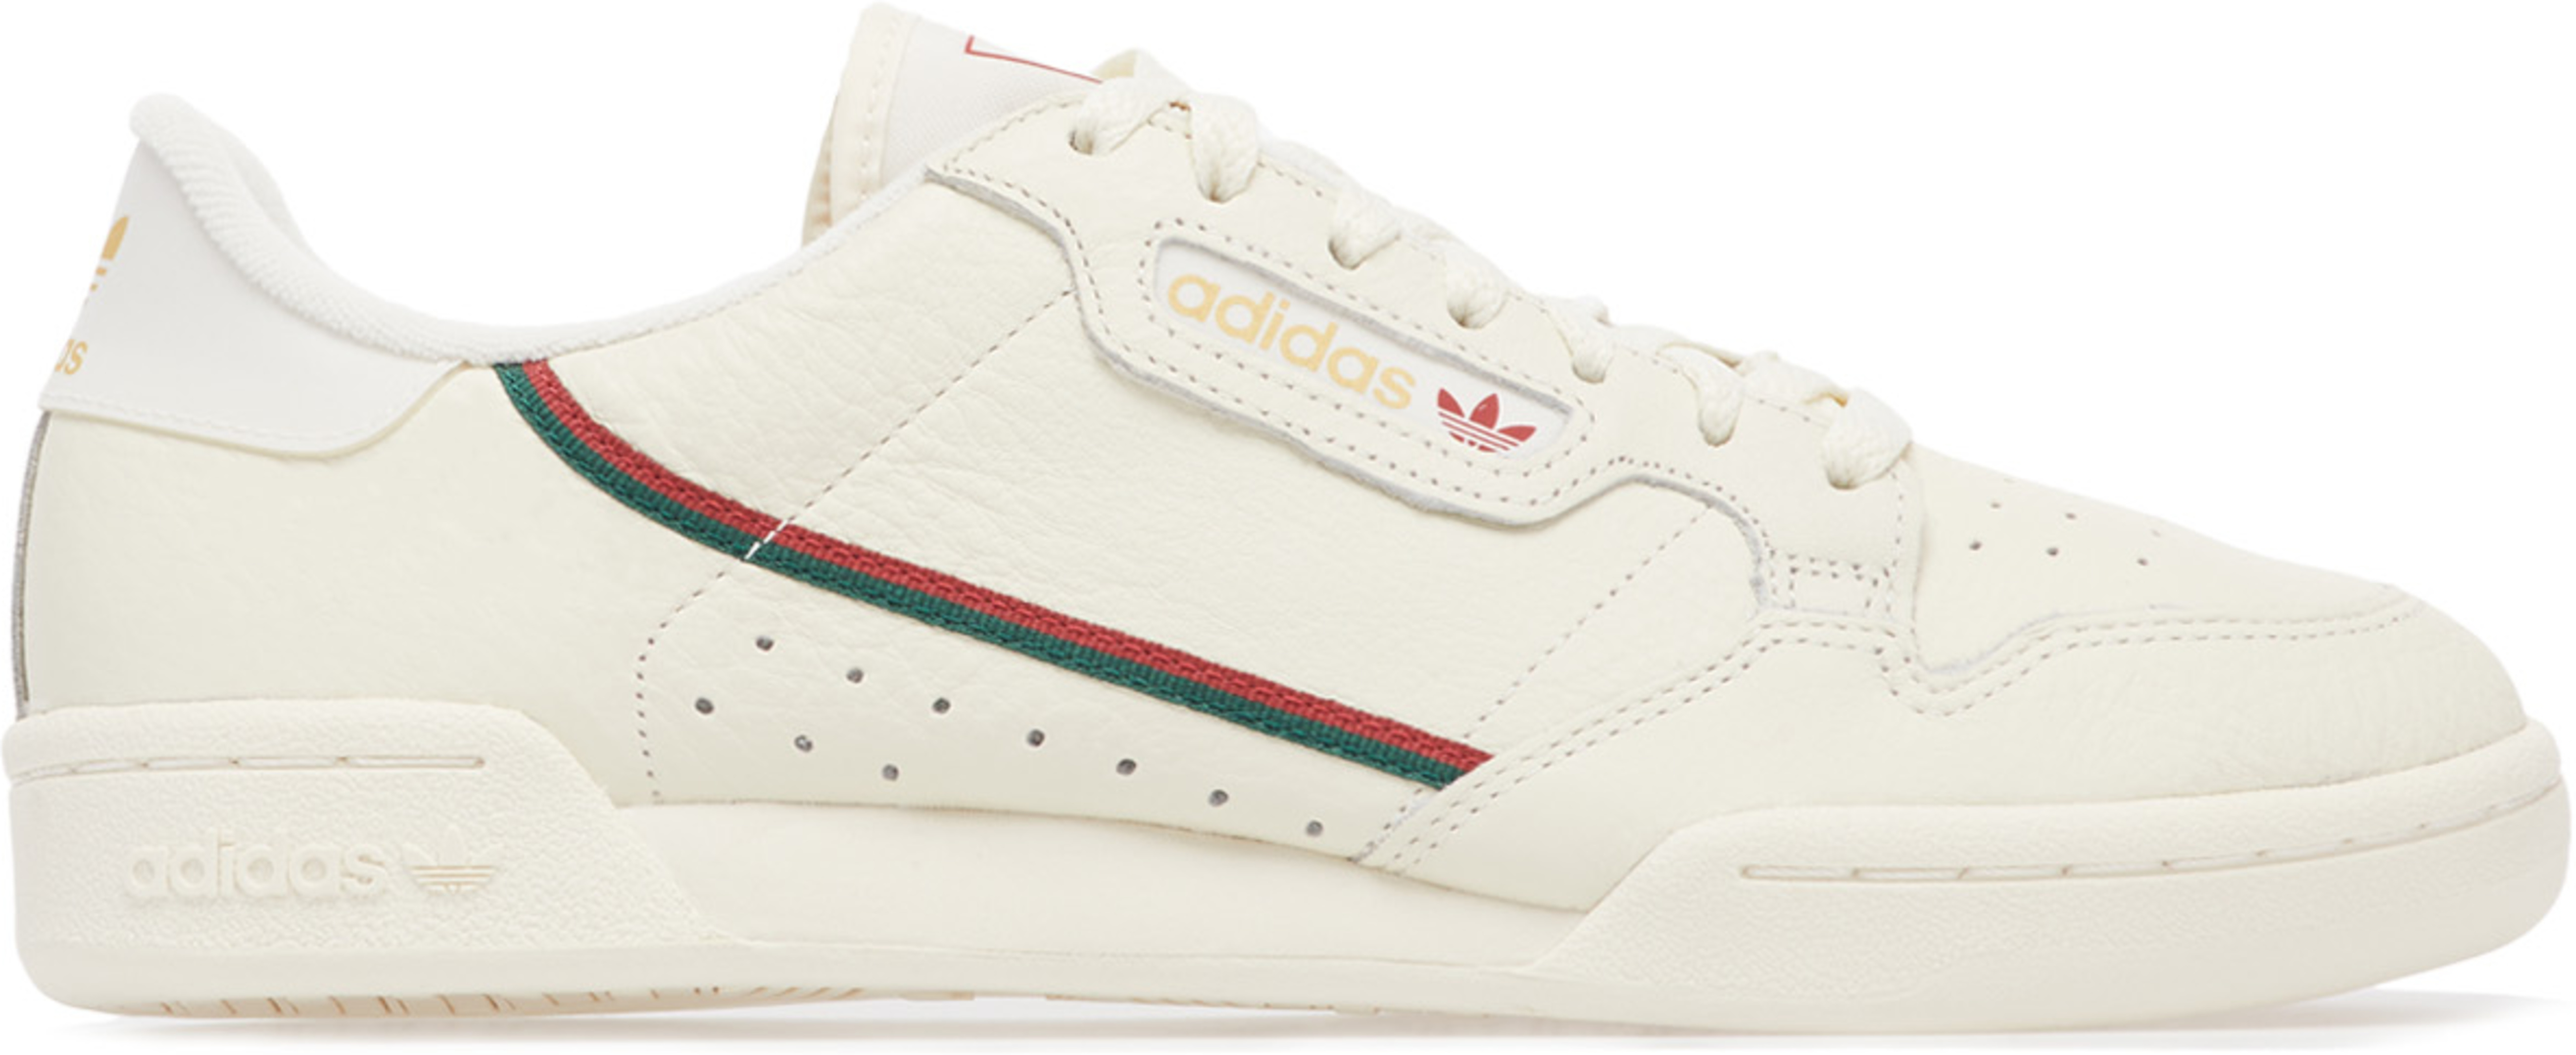 adidas Originals Continental 80 Core WhiteActive MaroonCollegiate Green